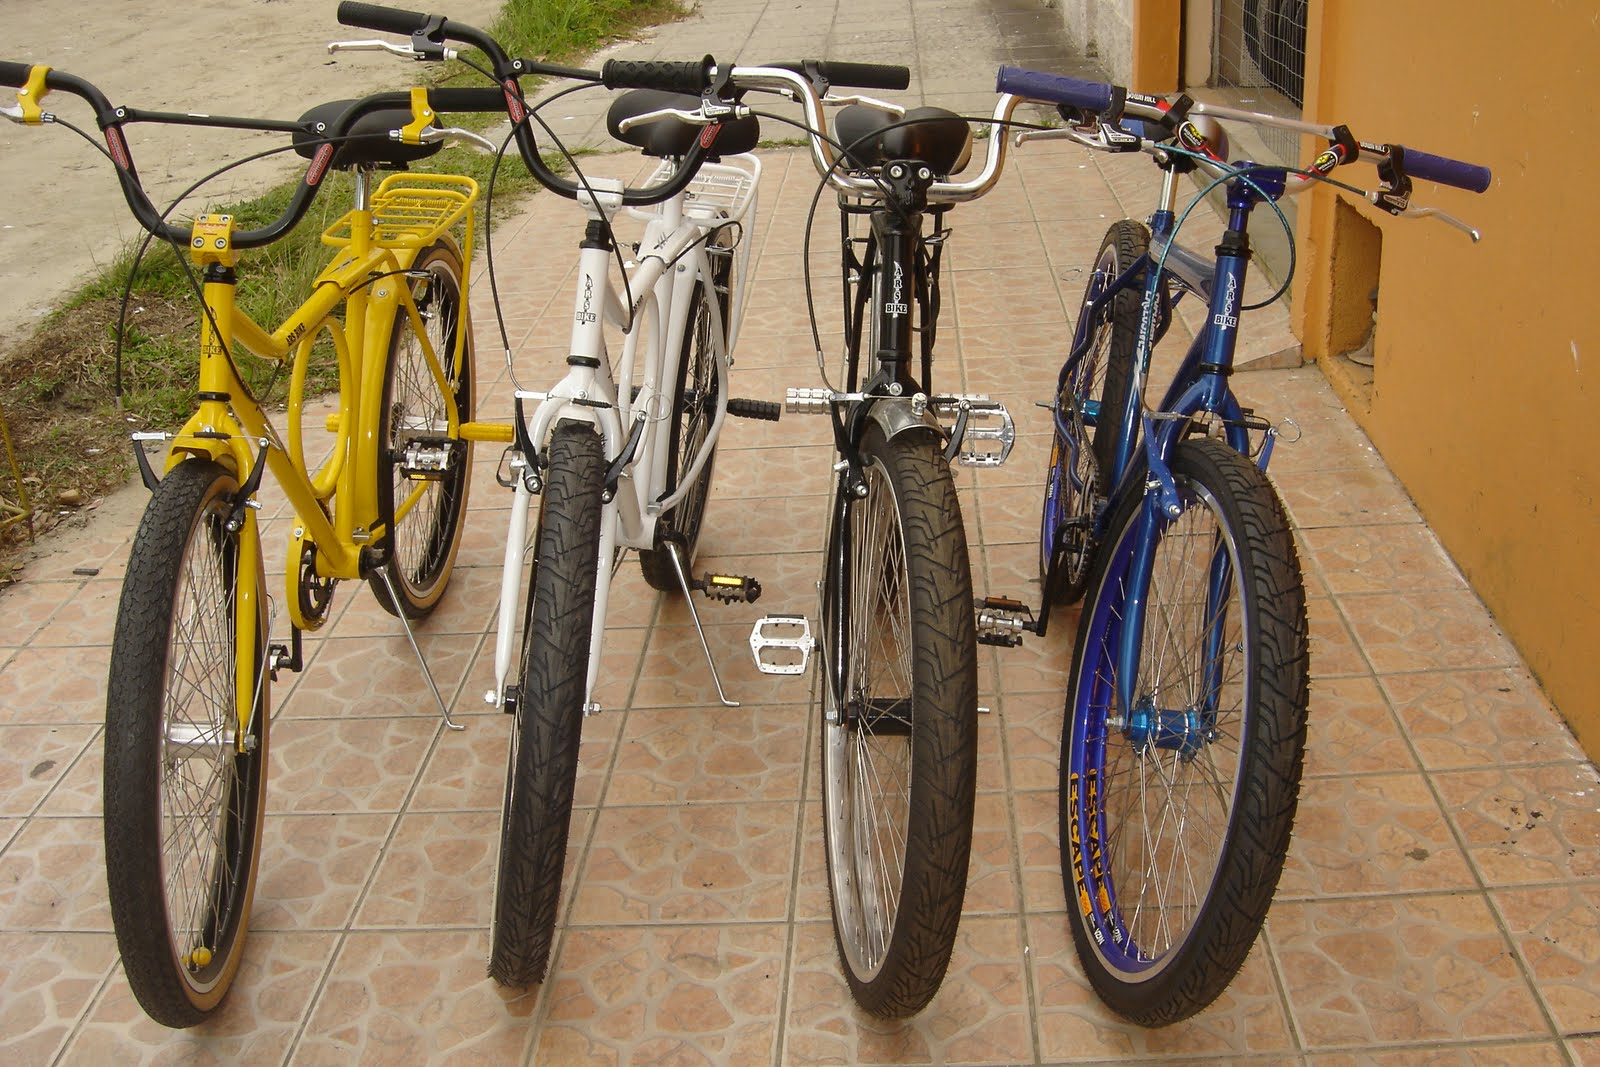 Ars Bike Ars Exclusive Aro Duplo Pneu Extra Largo